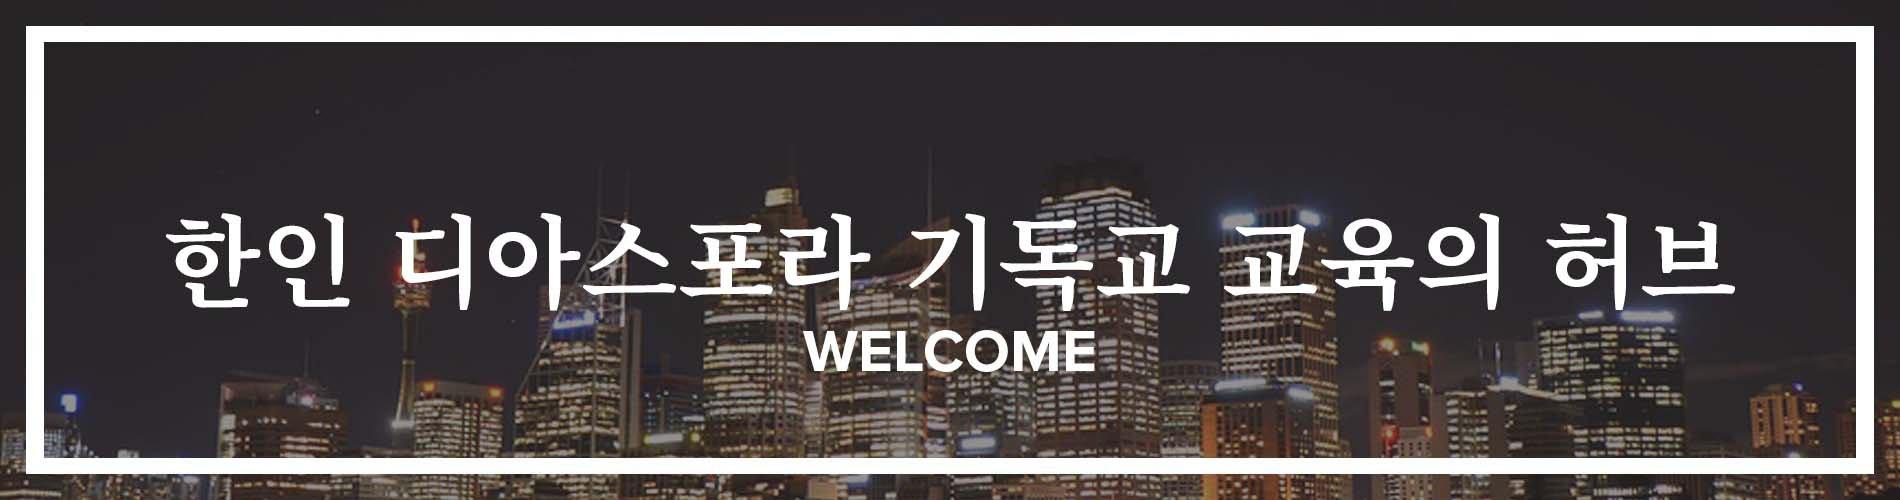 Korean Welcome